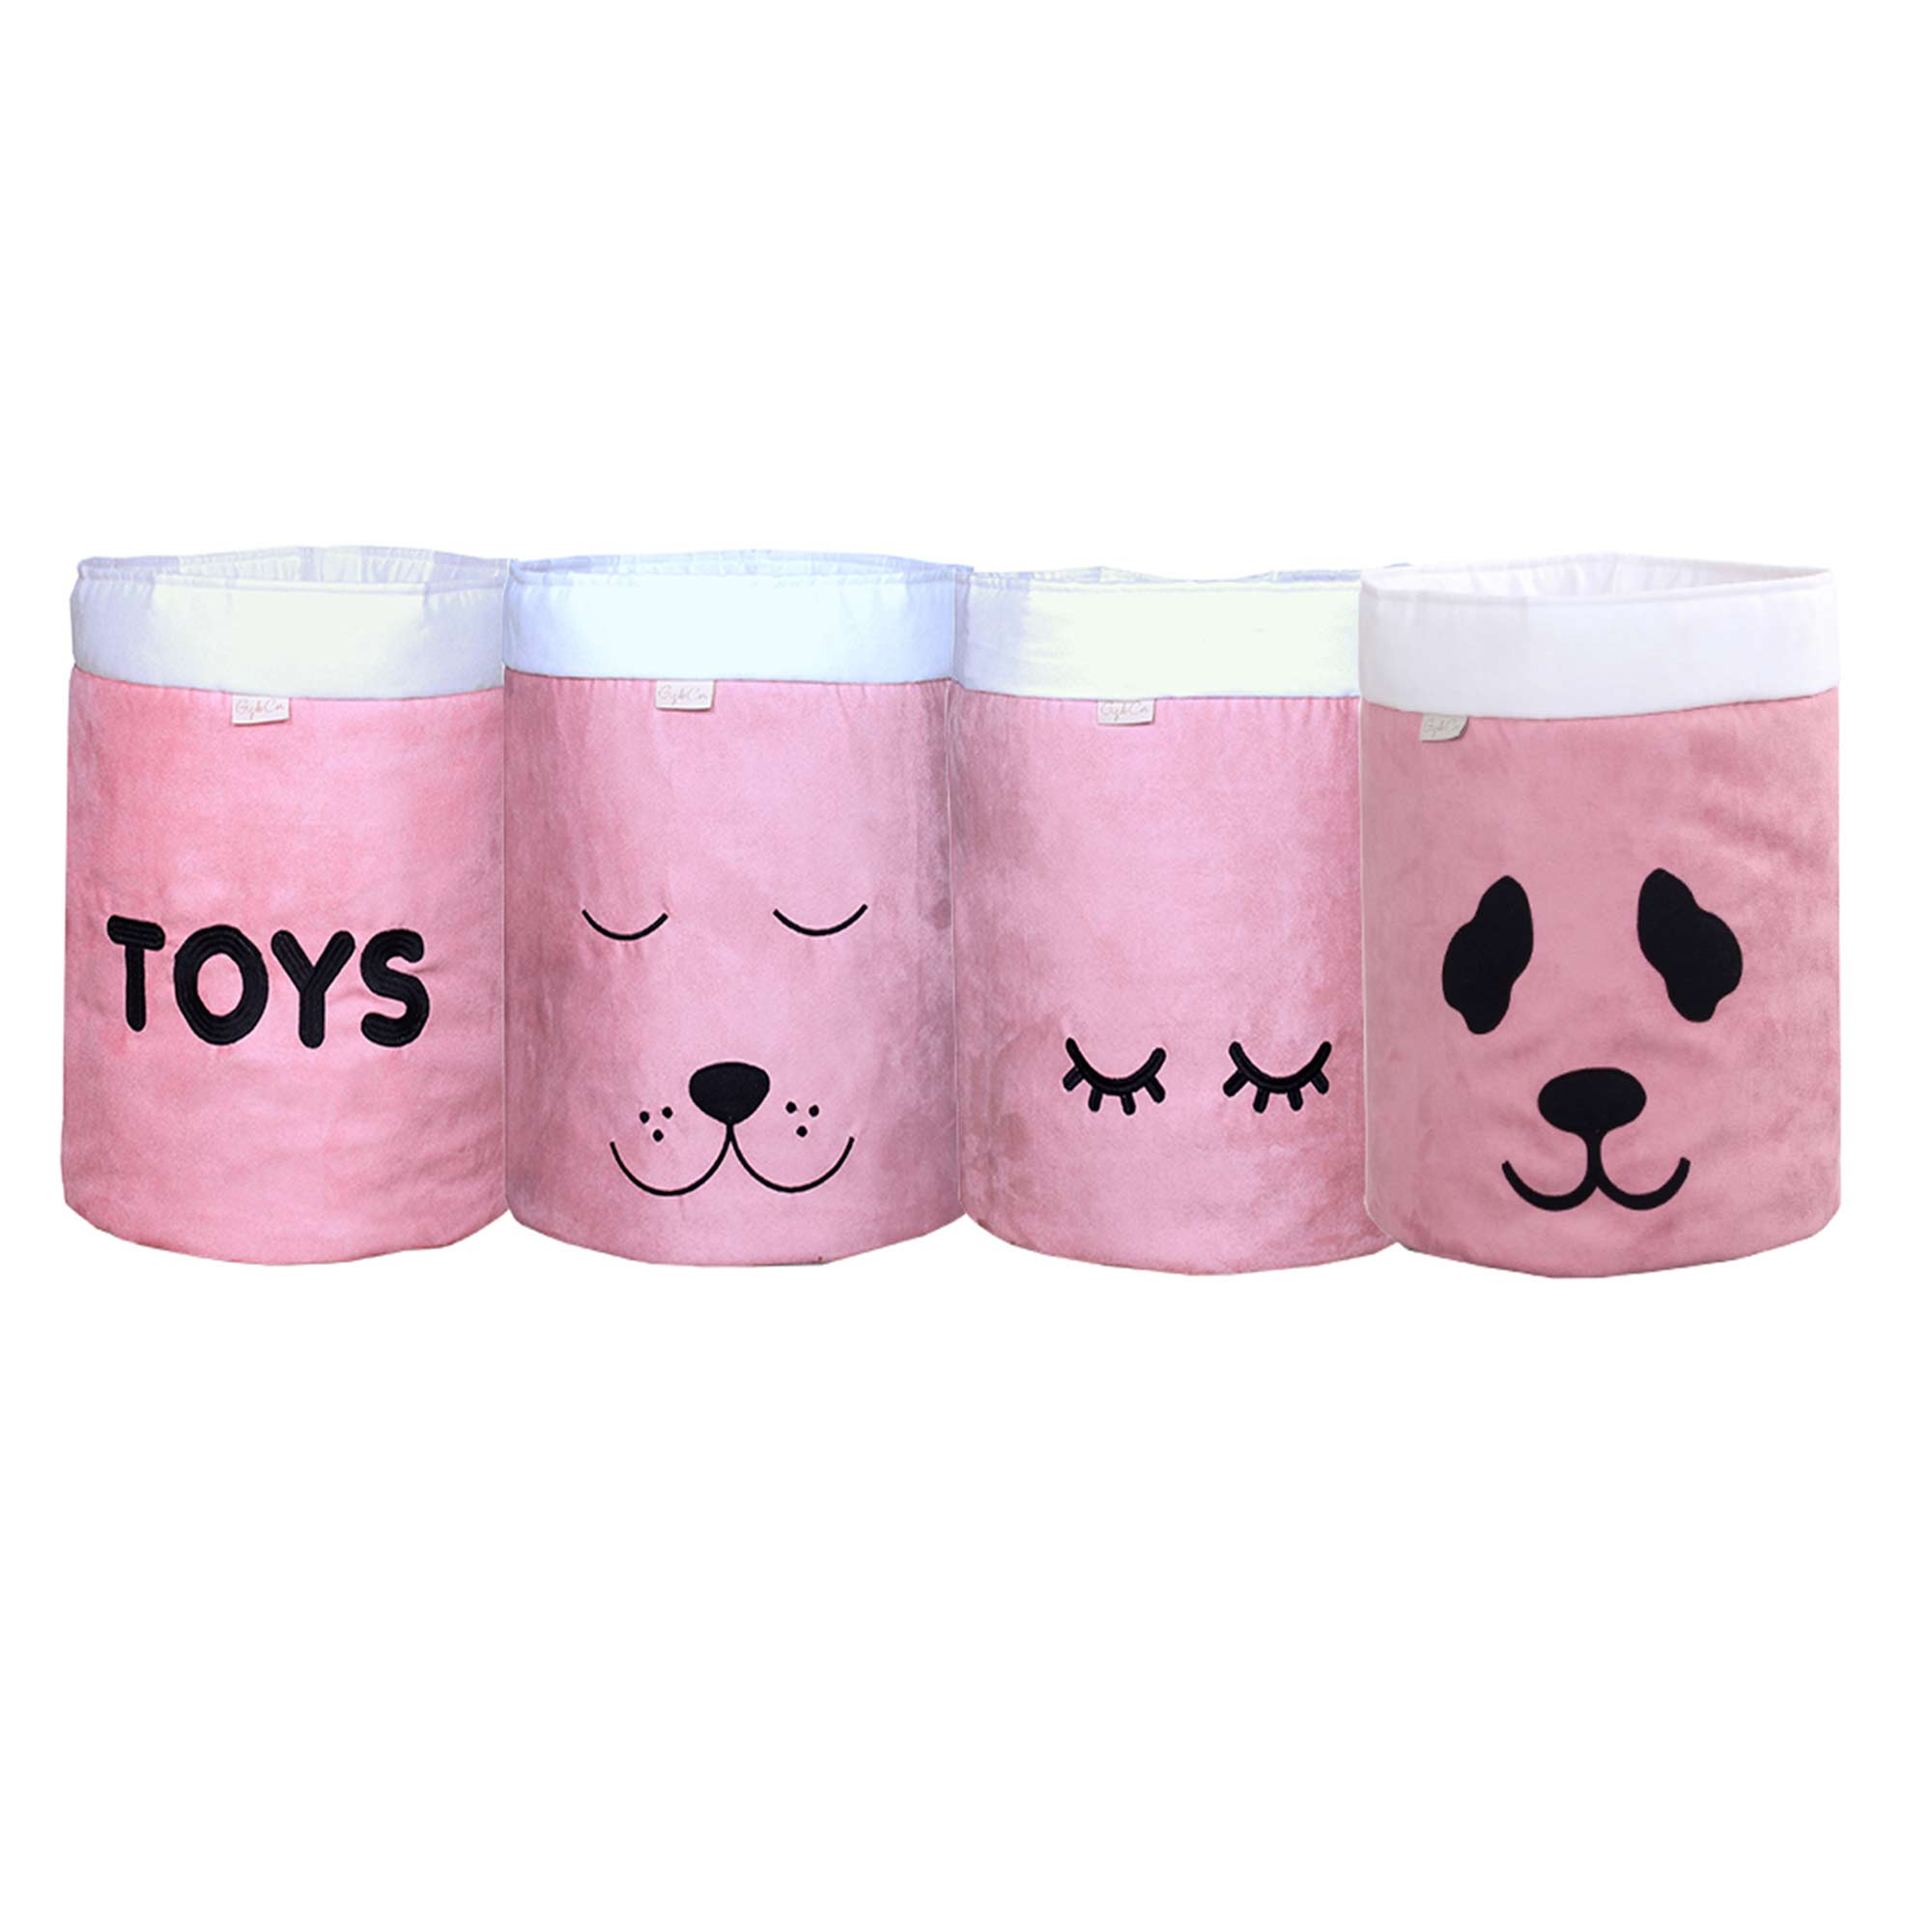 Conjunto de Cestos Organizadores Para Brinquedos Rosê com Cru